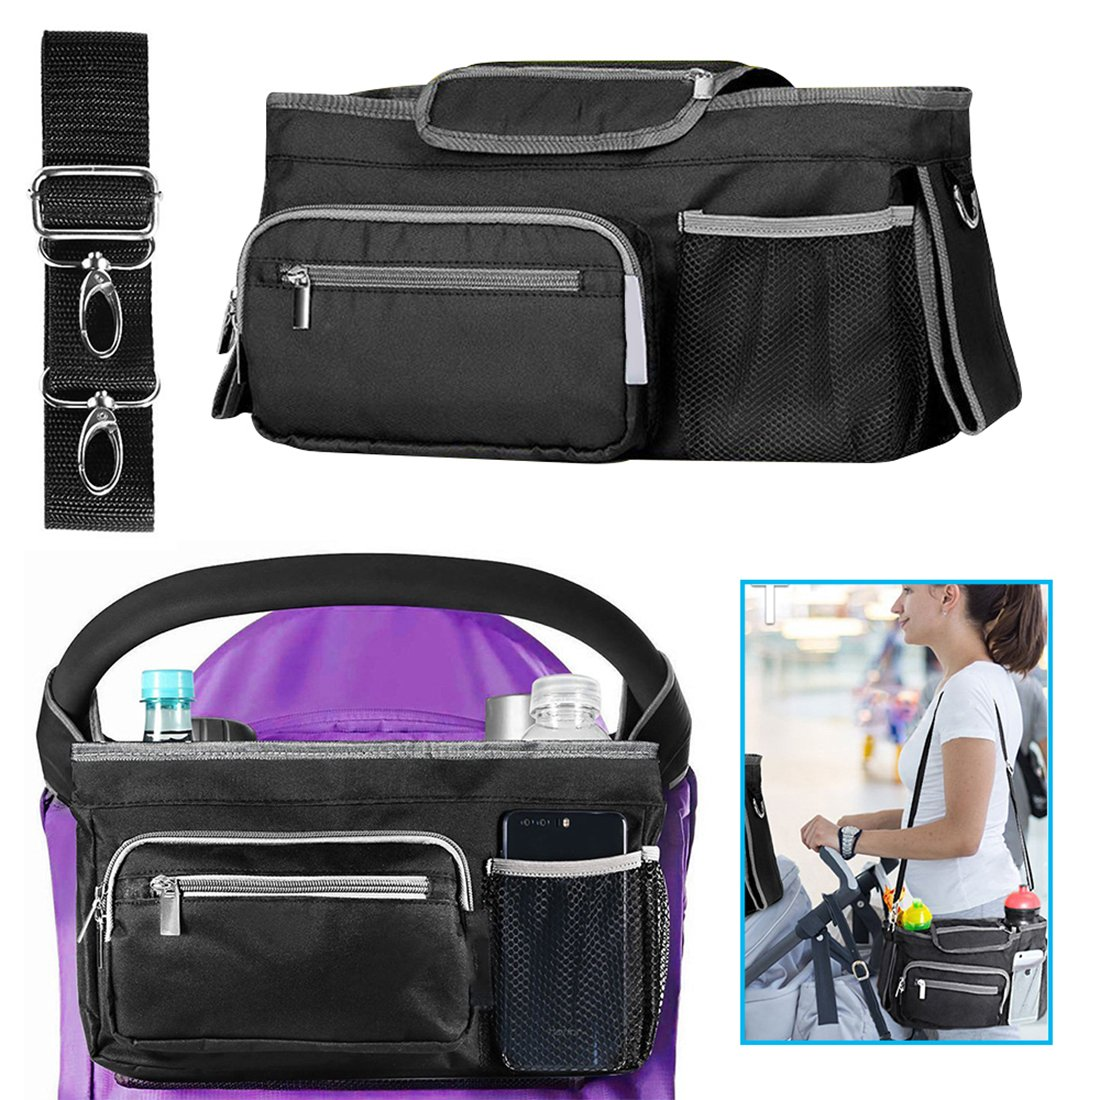 Baby Pram Buggy Stroller Organizer, BBgoto Stroller Organizer with Pockets/Bottle Holder/ Shoulder Strap, Large Storage Capacity